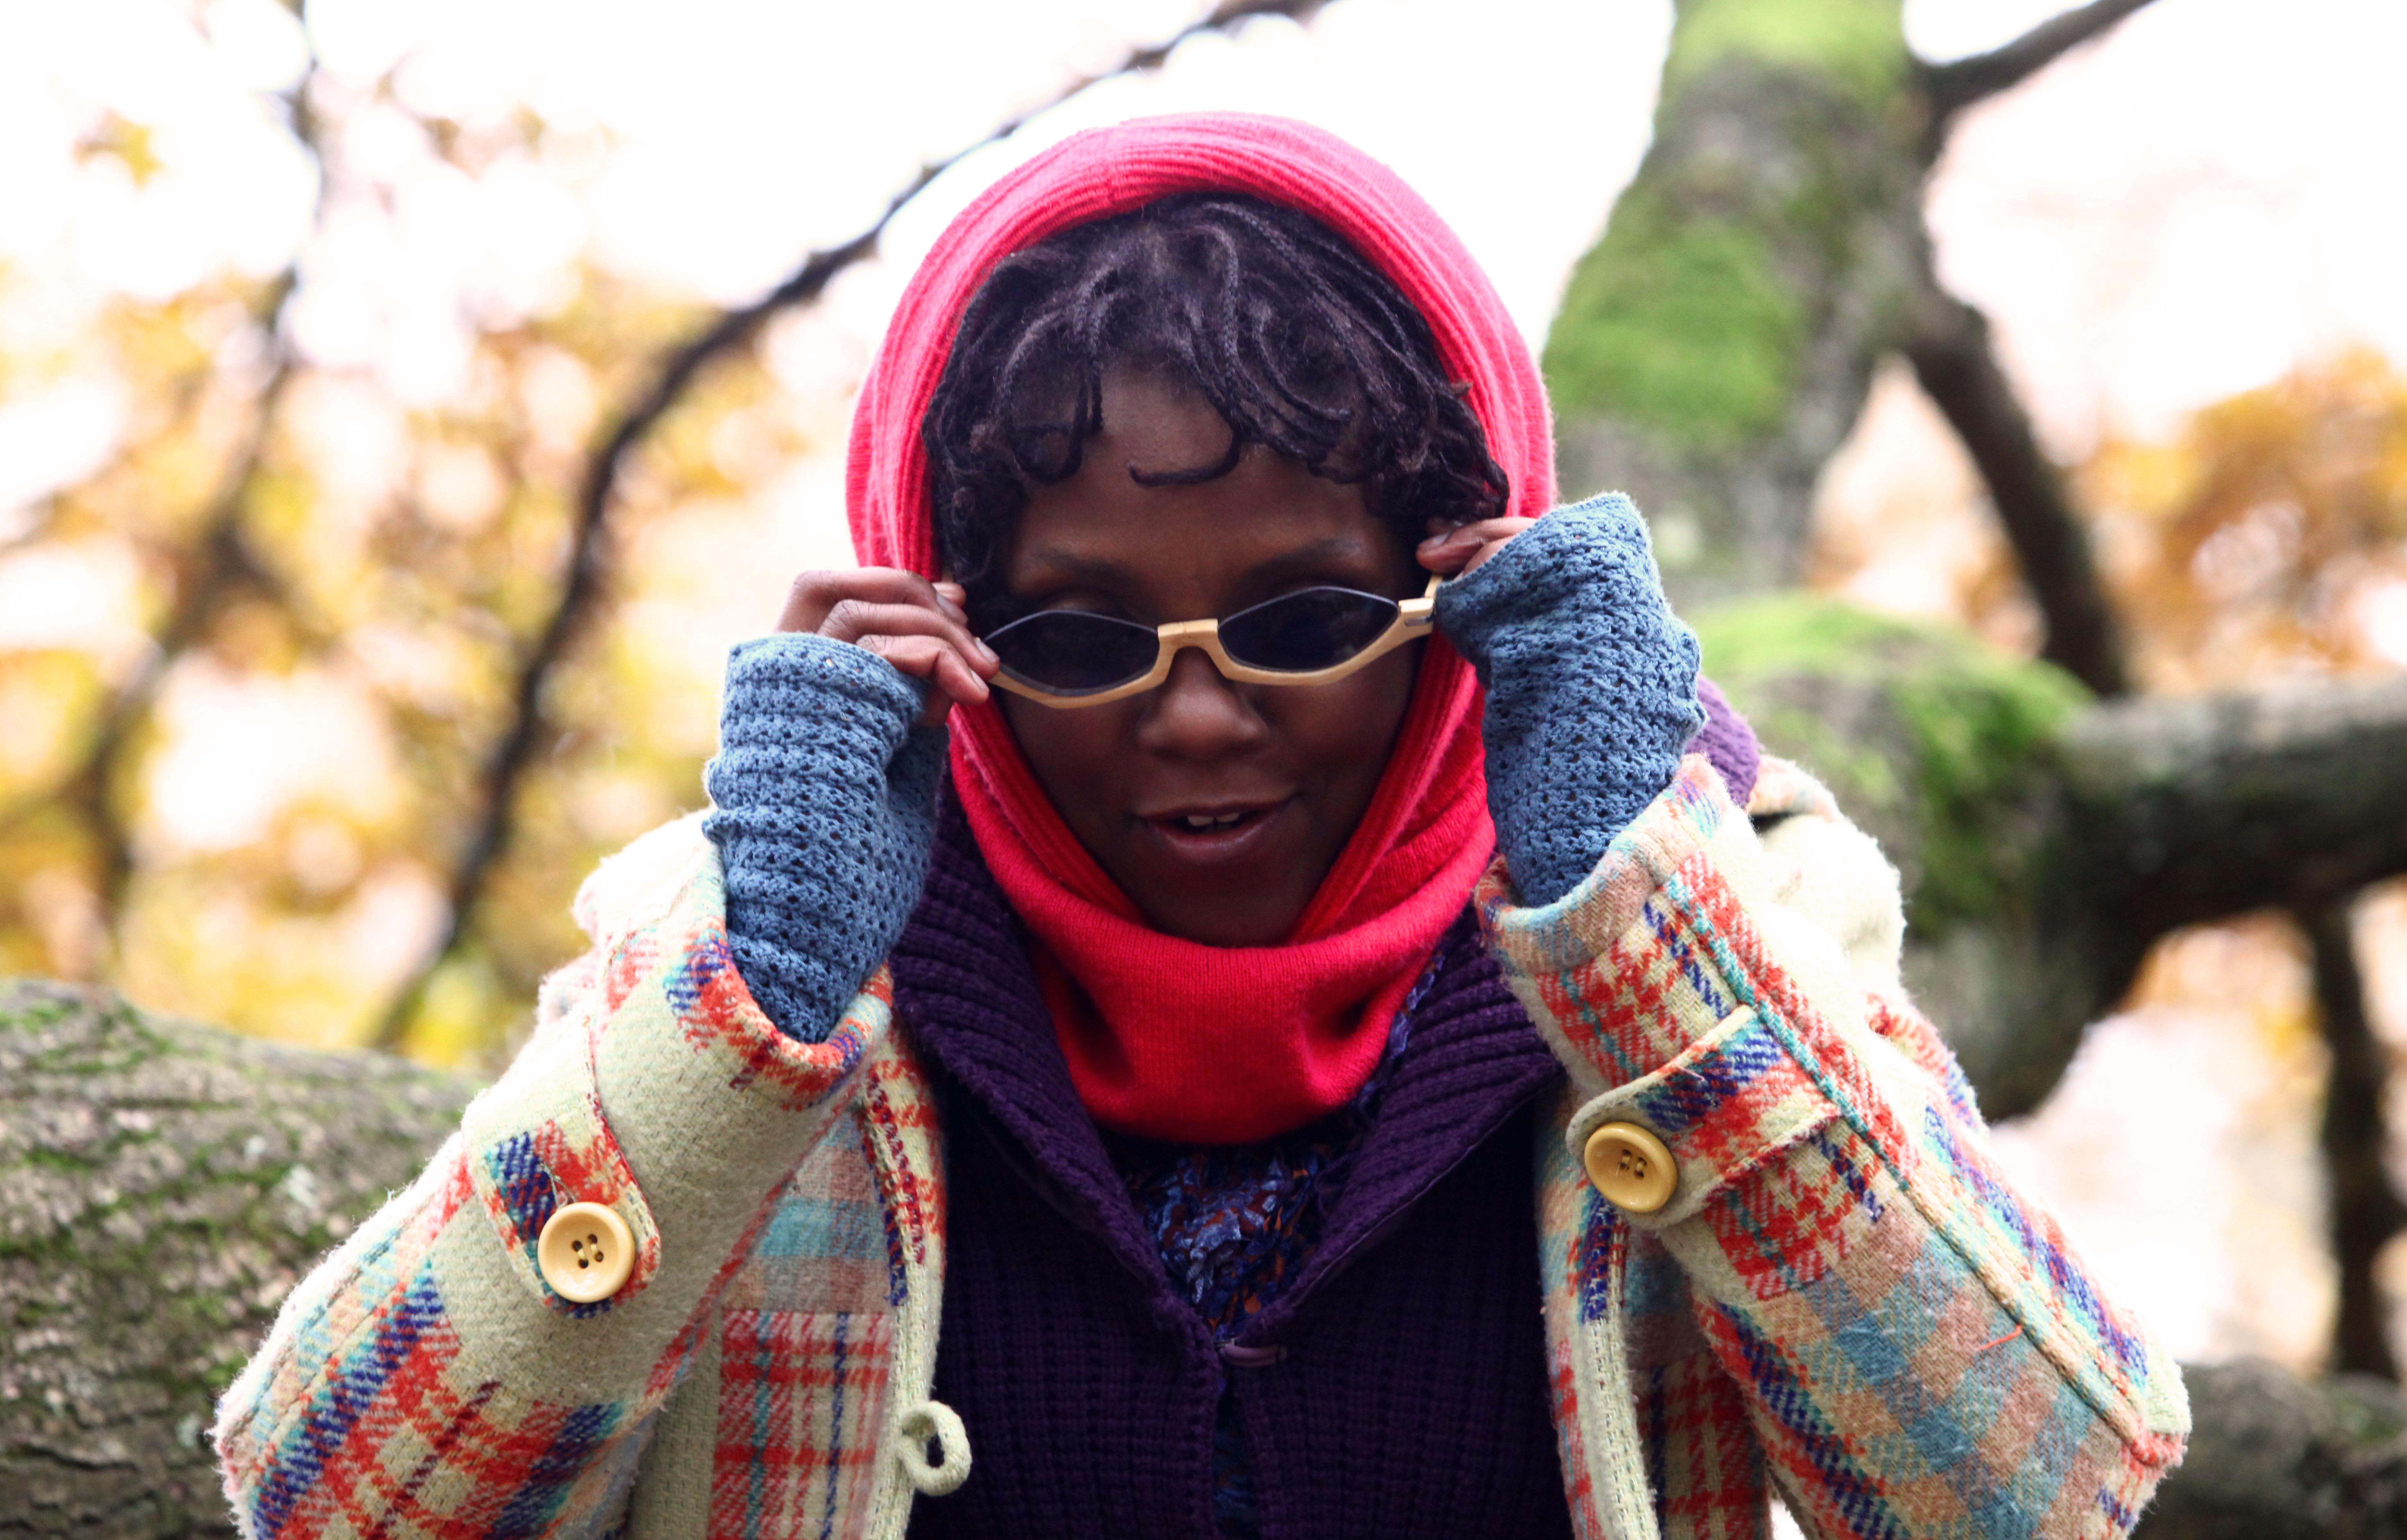 Carleen anderson photo shoot by Serene Marinelli for Bambooka